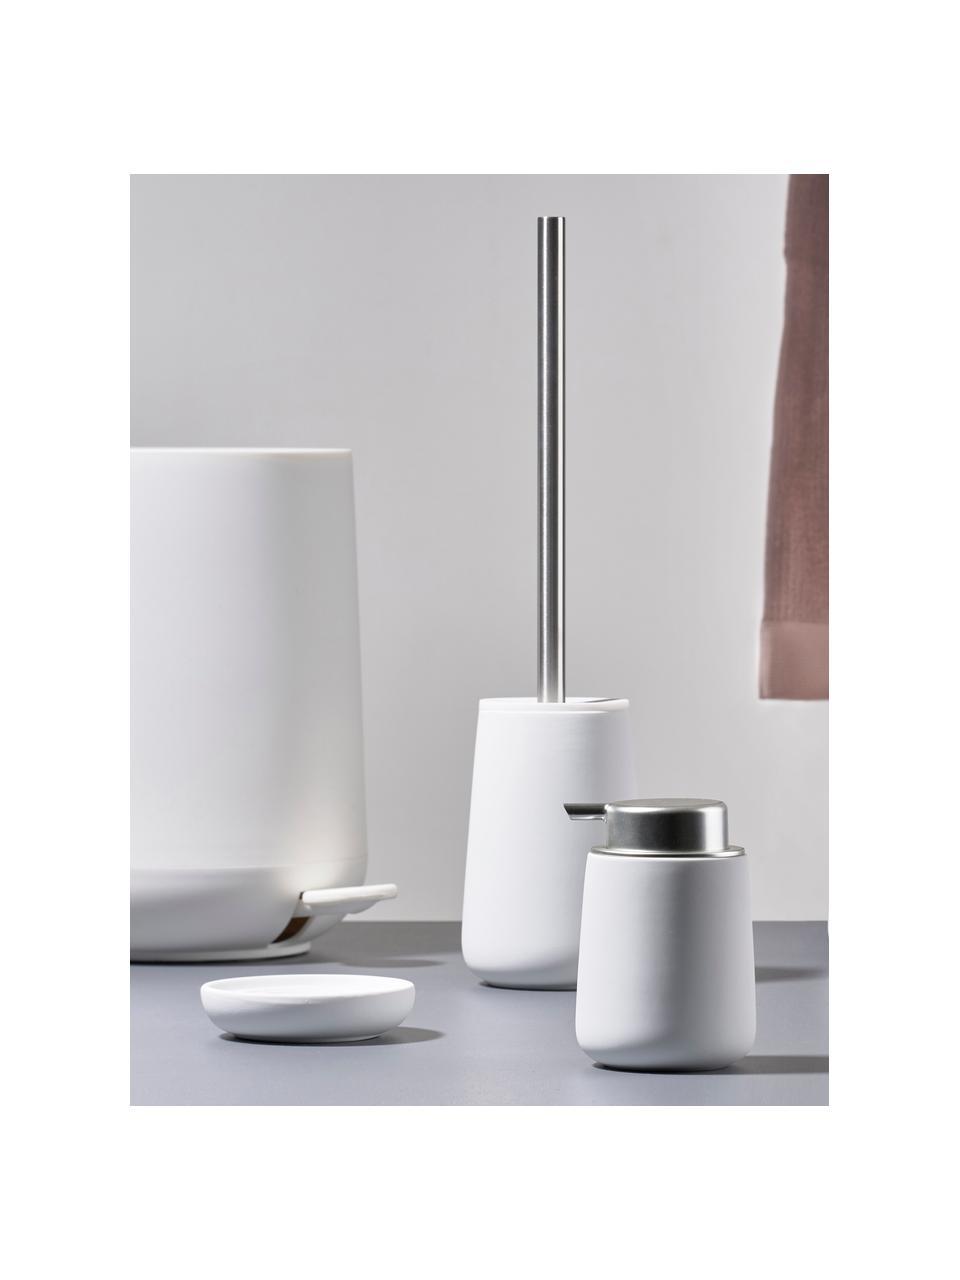 Porzellan-Seifenschale Nova One, Porzellan, Weiß, Ø 11 x H 3 cm